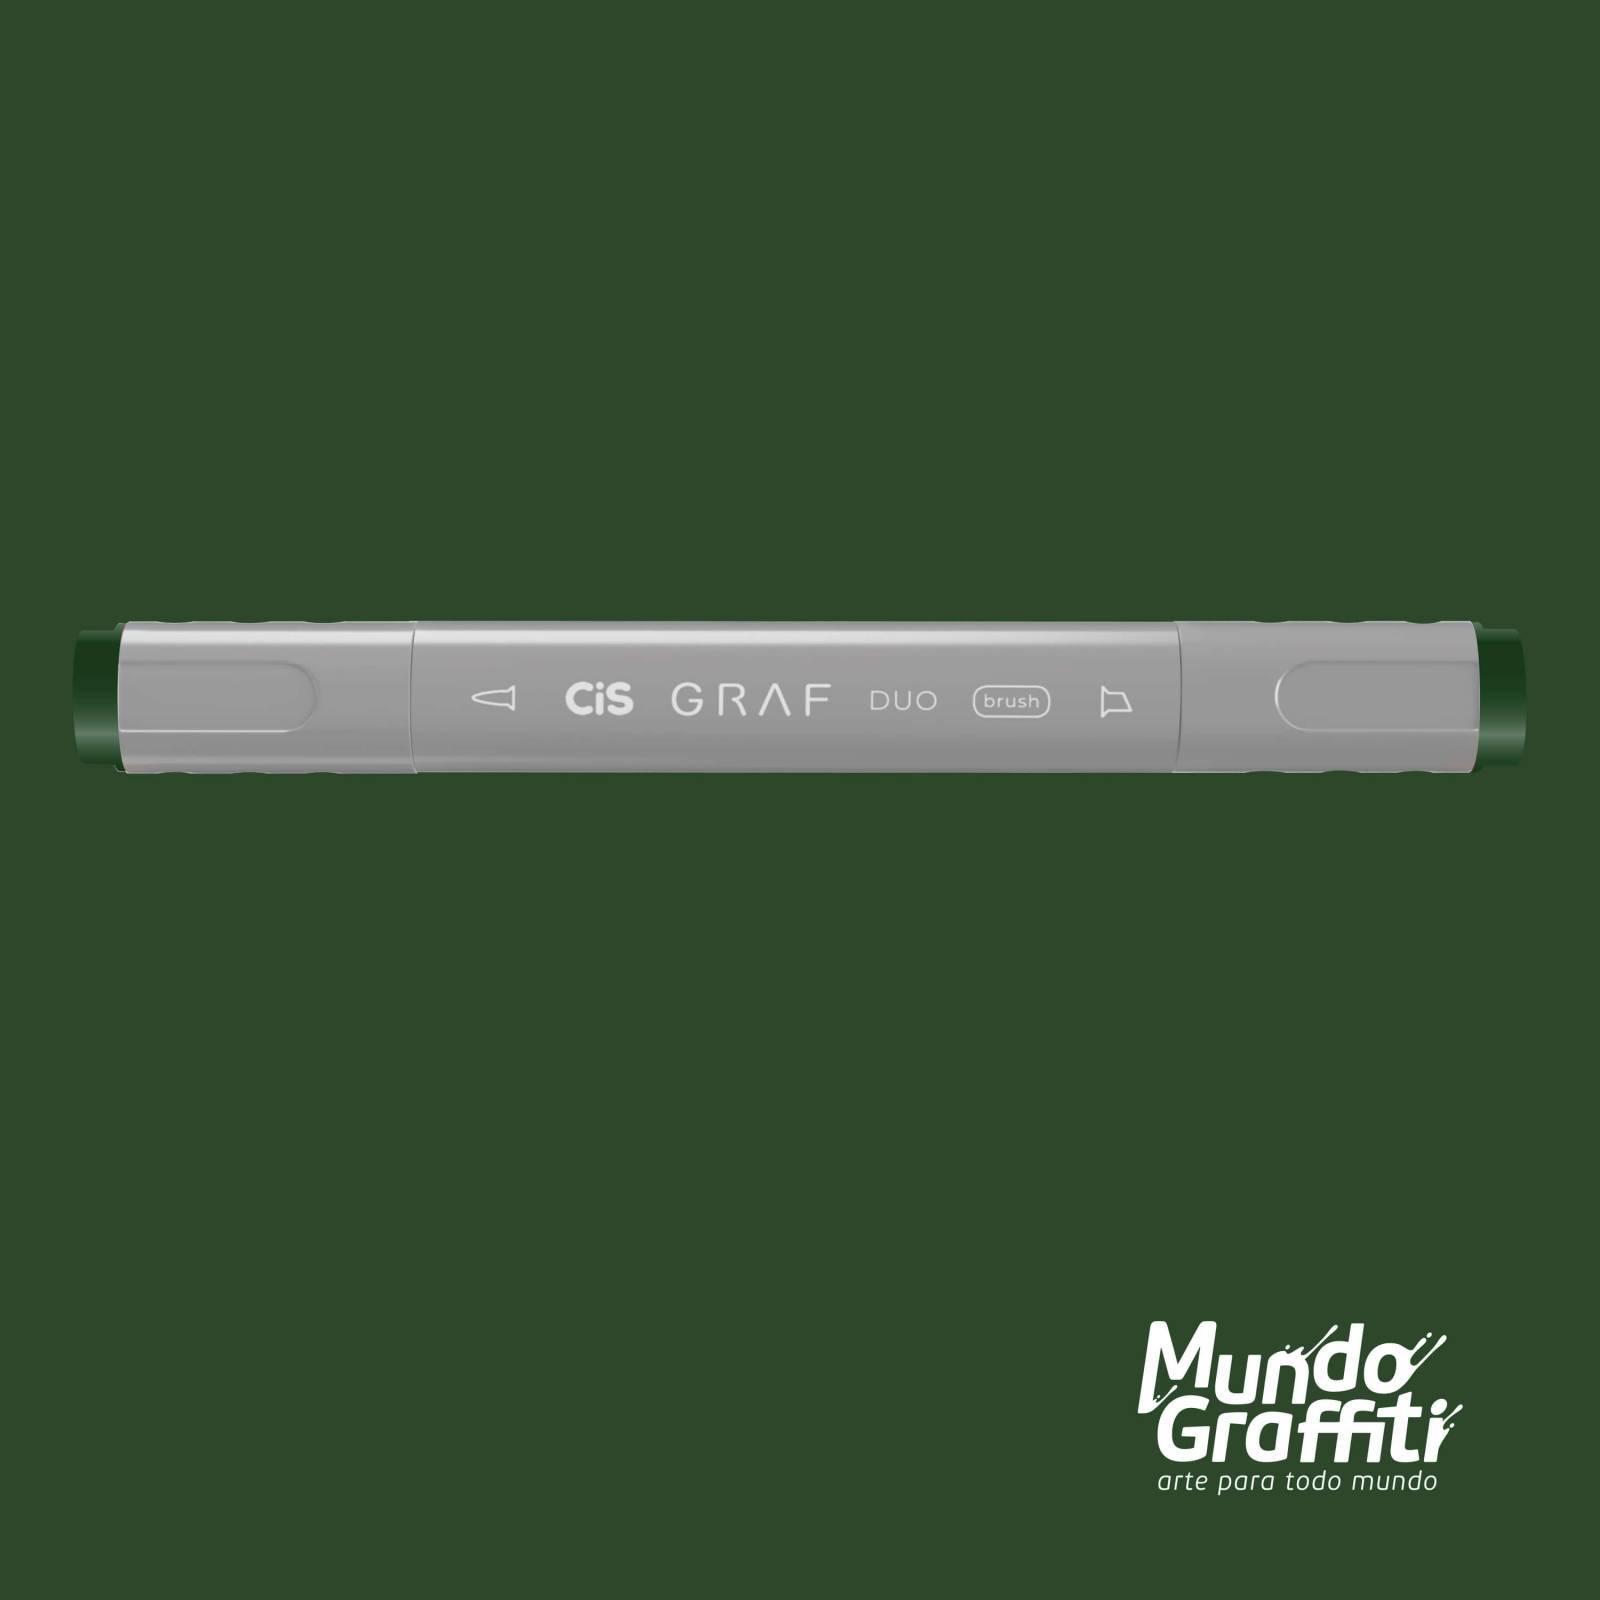 Marcador Cis Graf Duo Brush Dark Green 51 - Mundo Graffiti